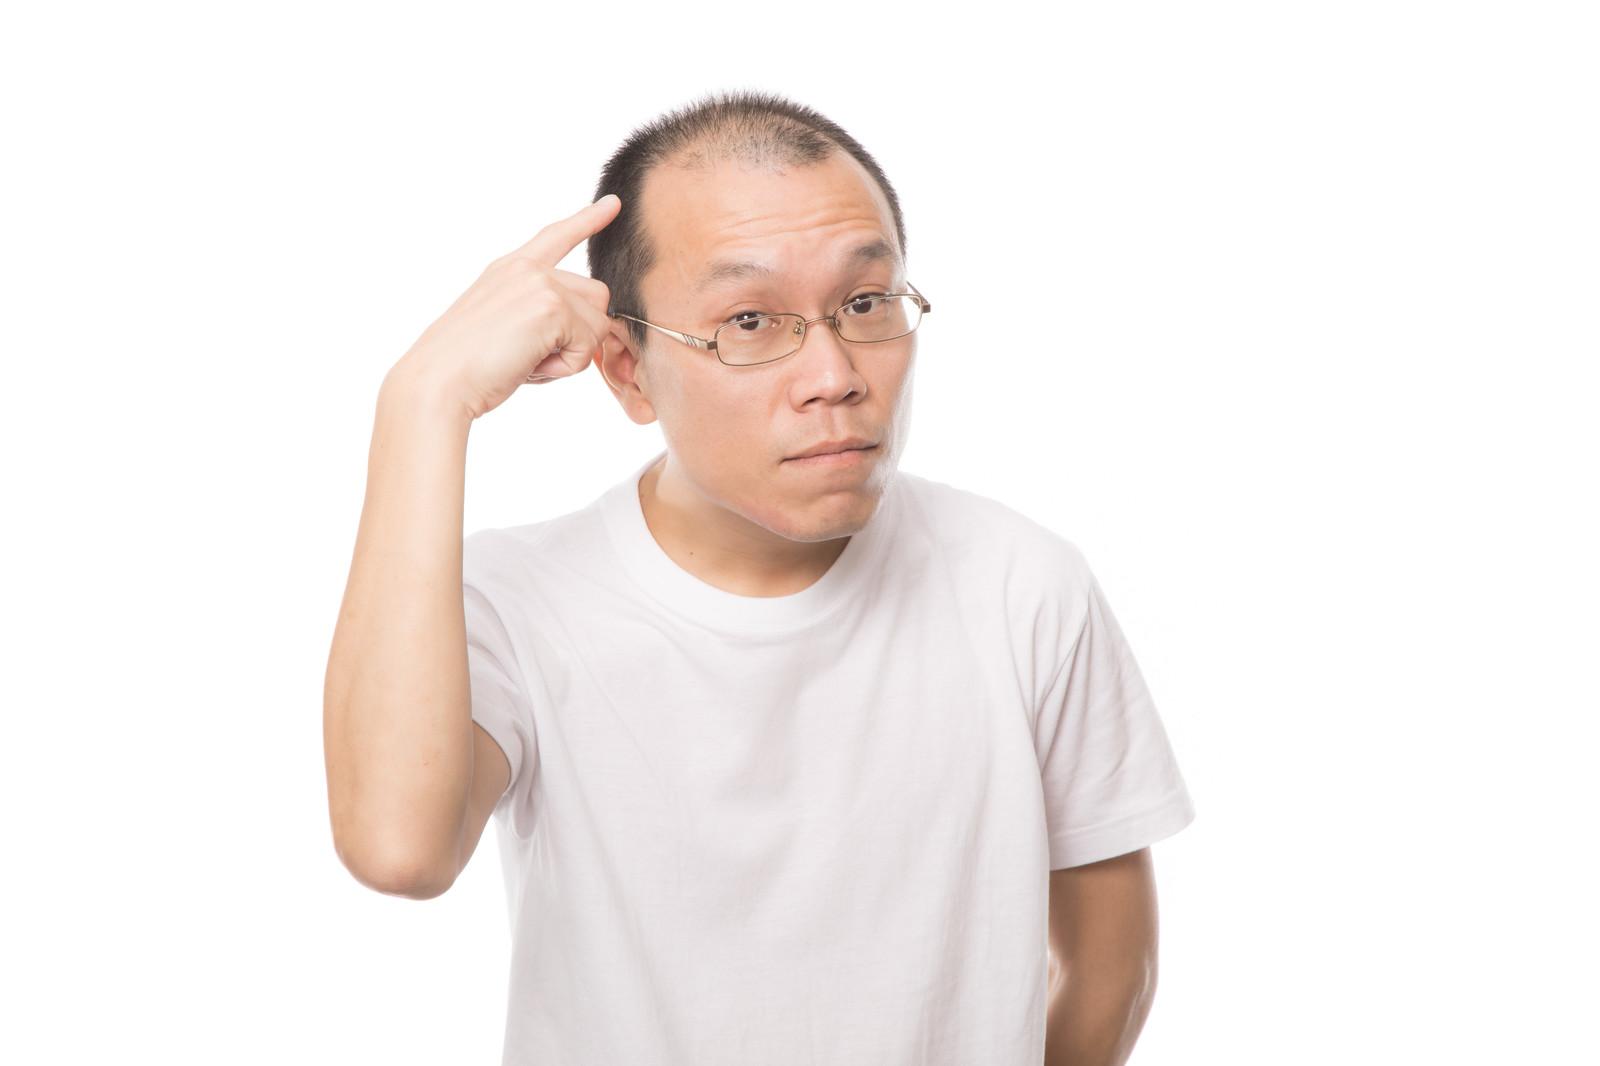 MINOXI JET(ミノキジェット)とは?治療を受けられるクリニックは?